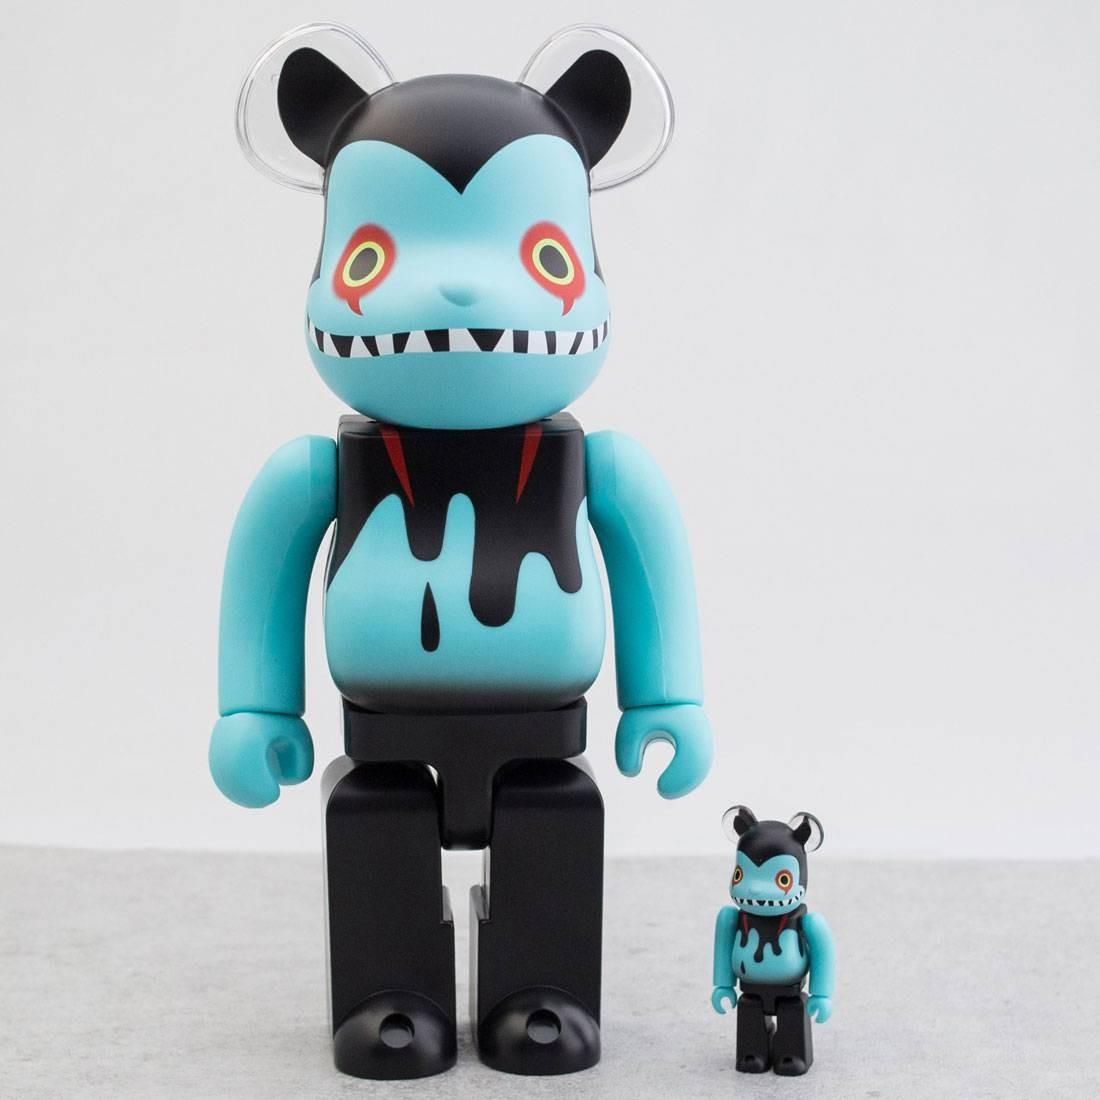 Medicom x Shoko Nakazawa Devilman Byron 100% 400% Bearbrick Figure Set (blue)